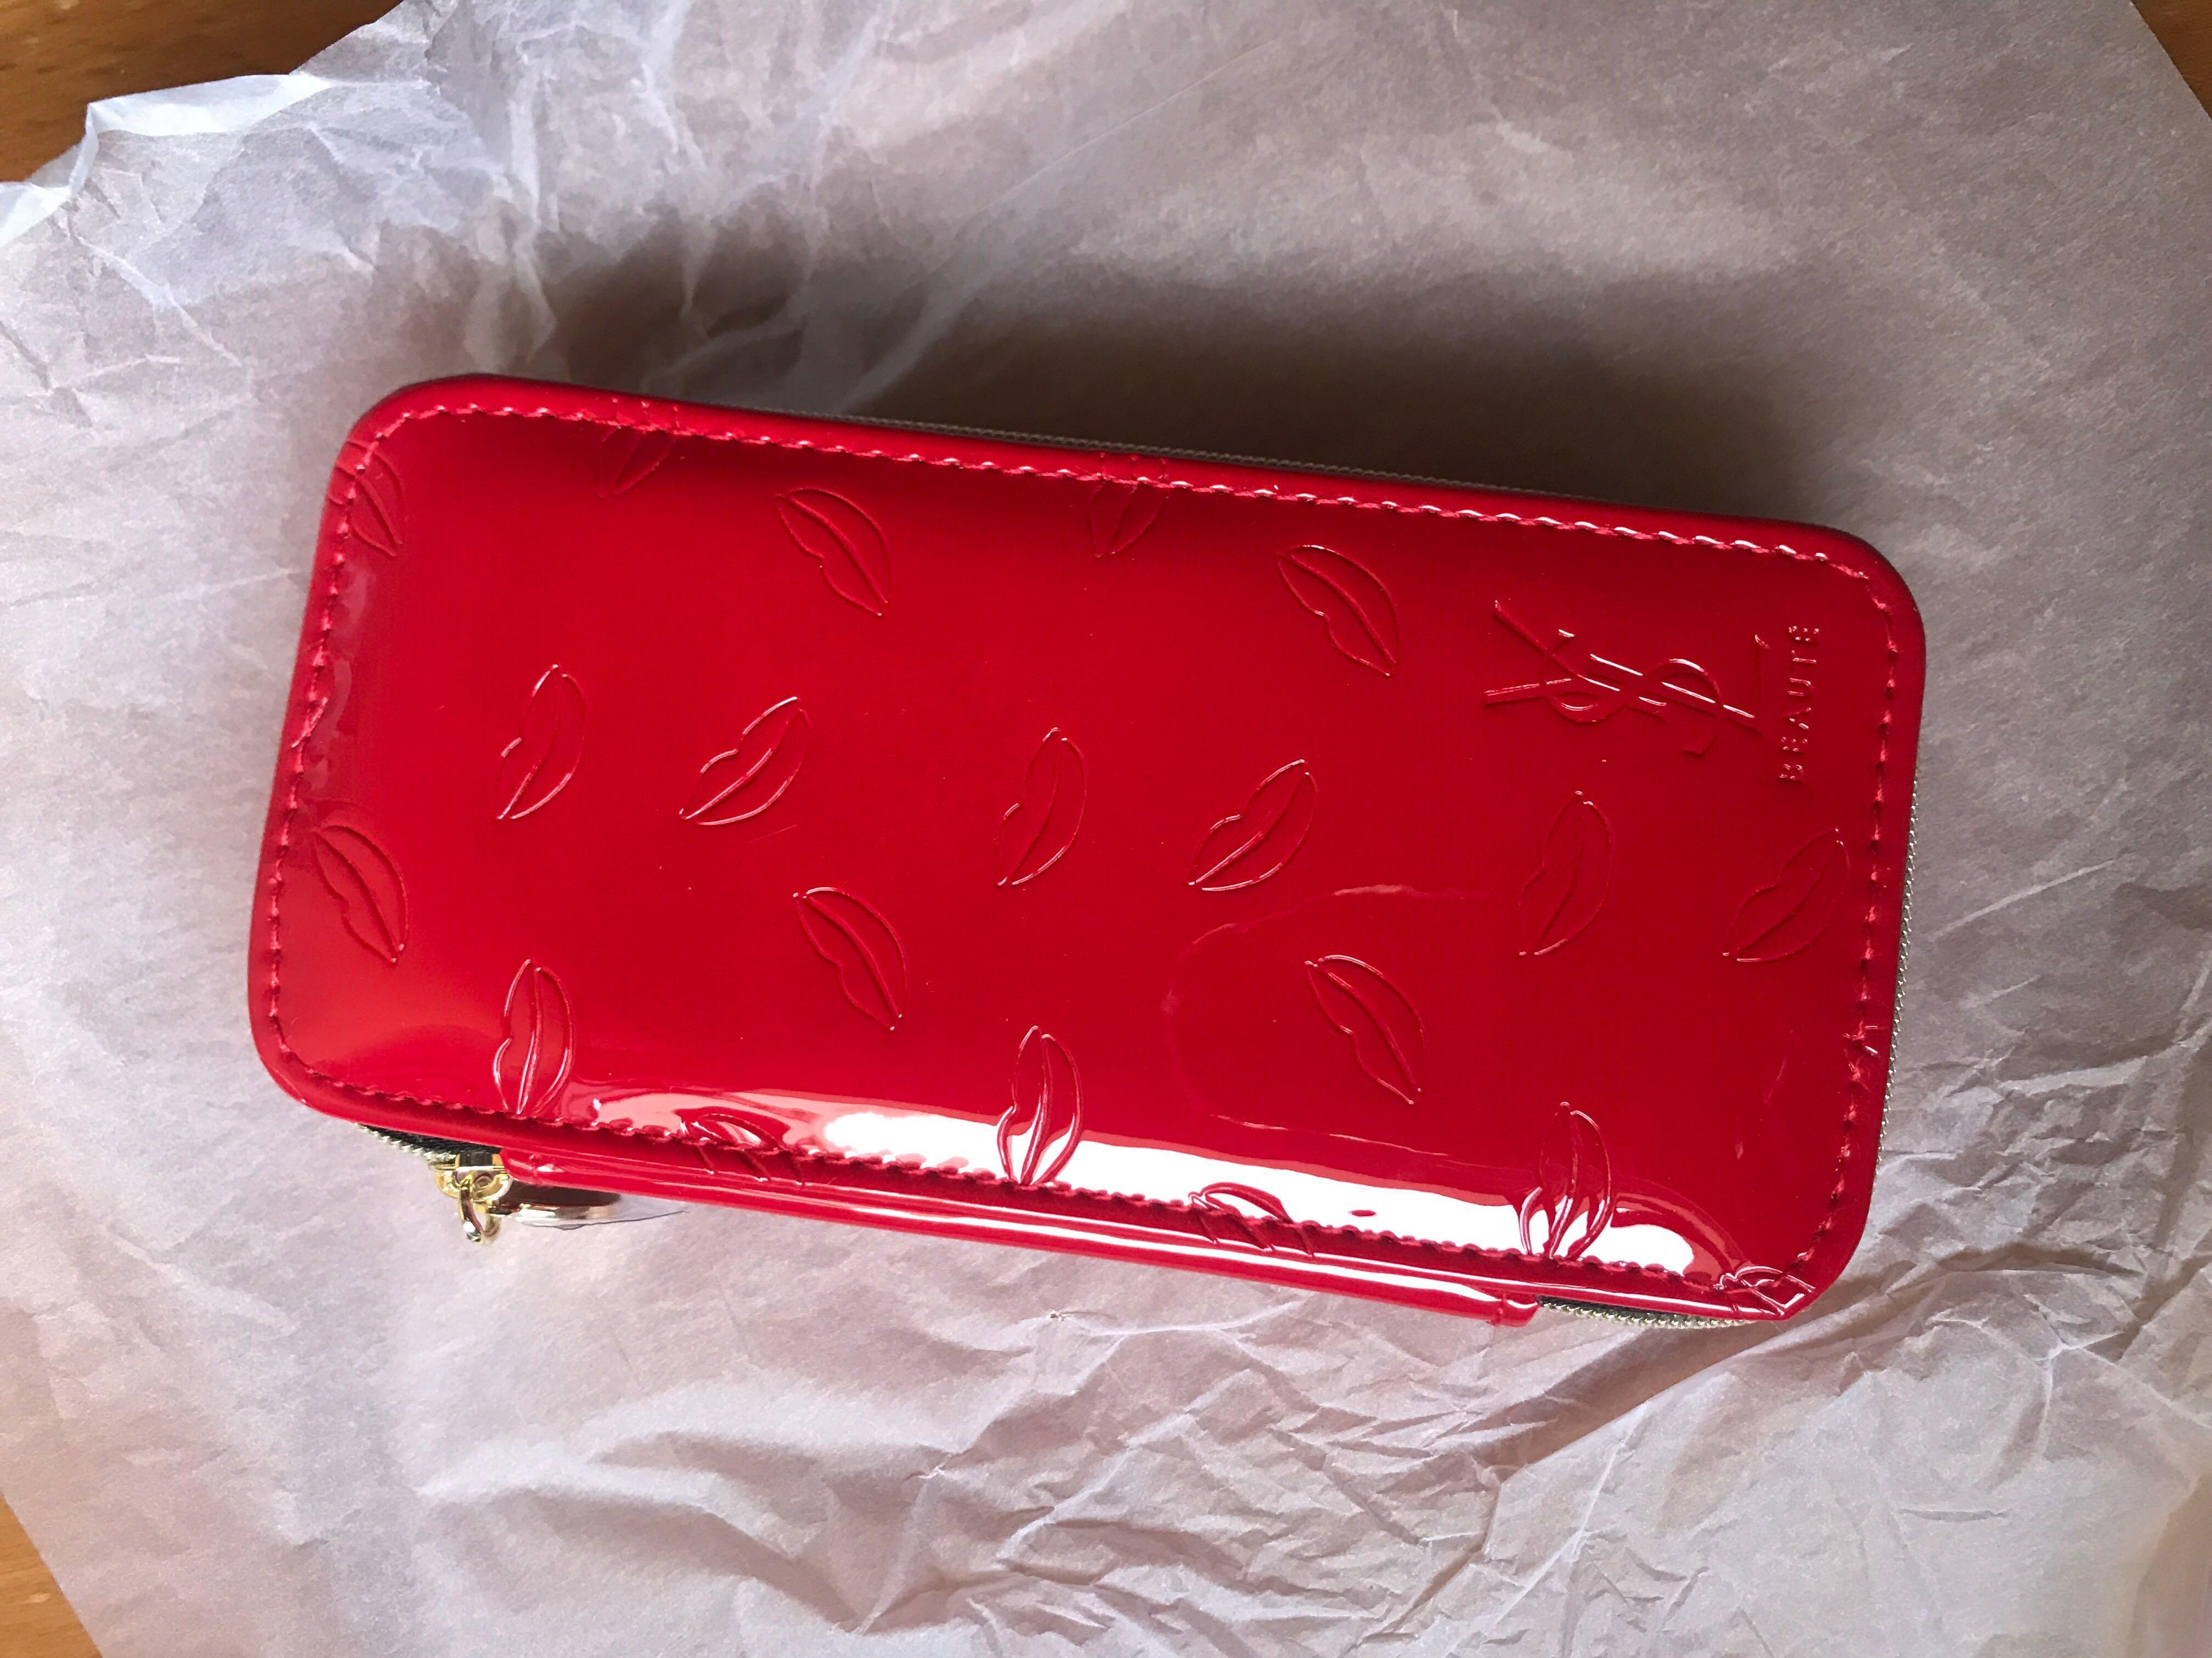 56cee039d52 YSL Travel Make up brush kit, Women's Fashion, Bags & Wallets ...